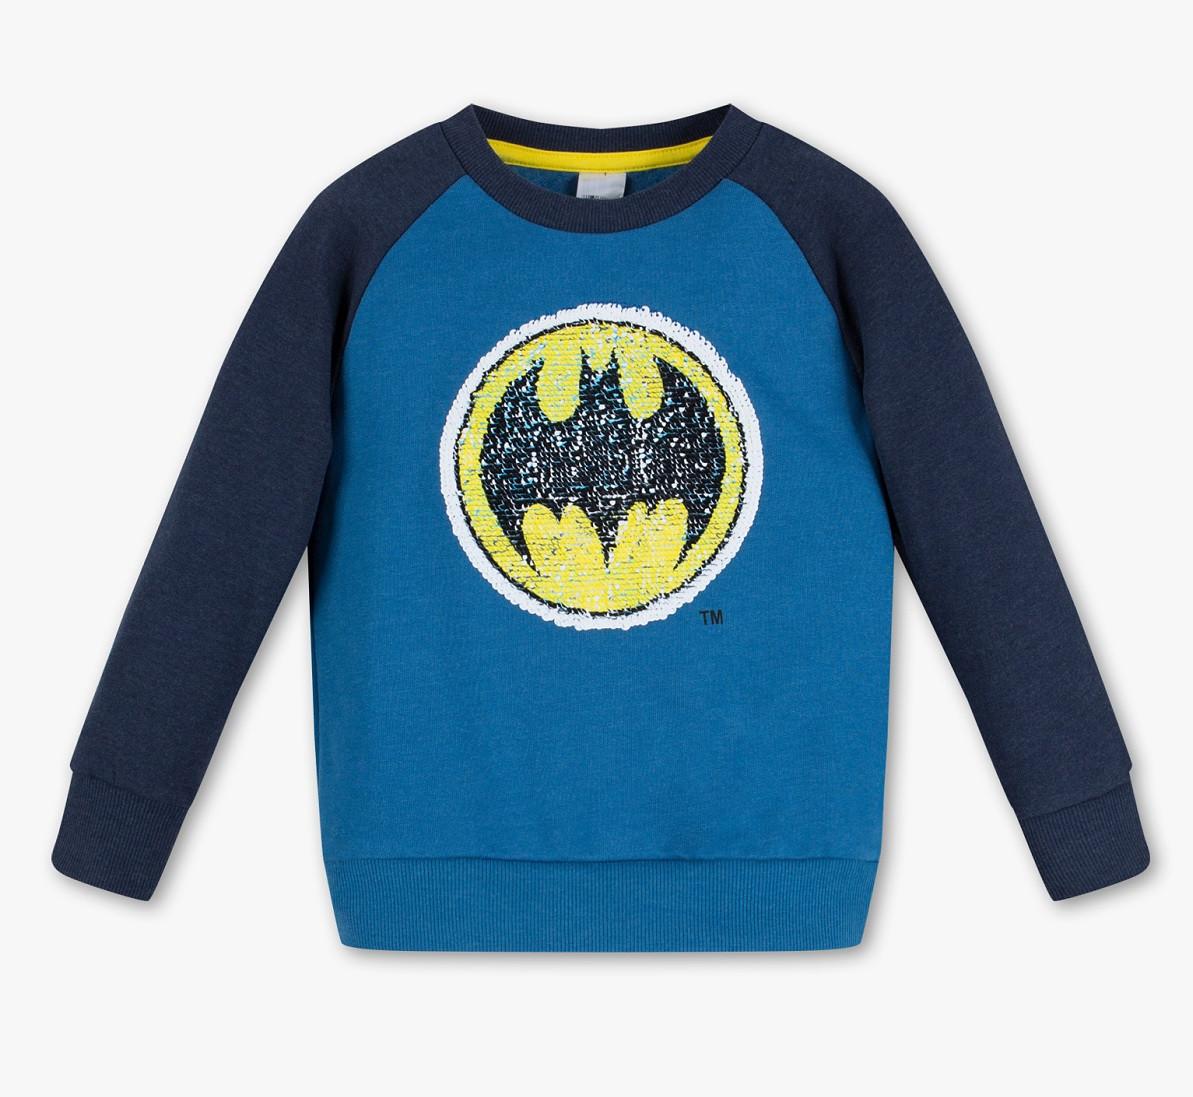 Свитшот Бэтмен для мальчика с меняющими пайетками C&A Германия Размер 122